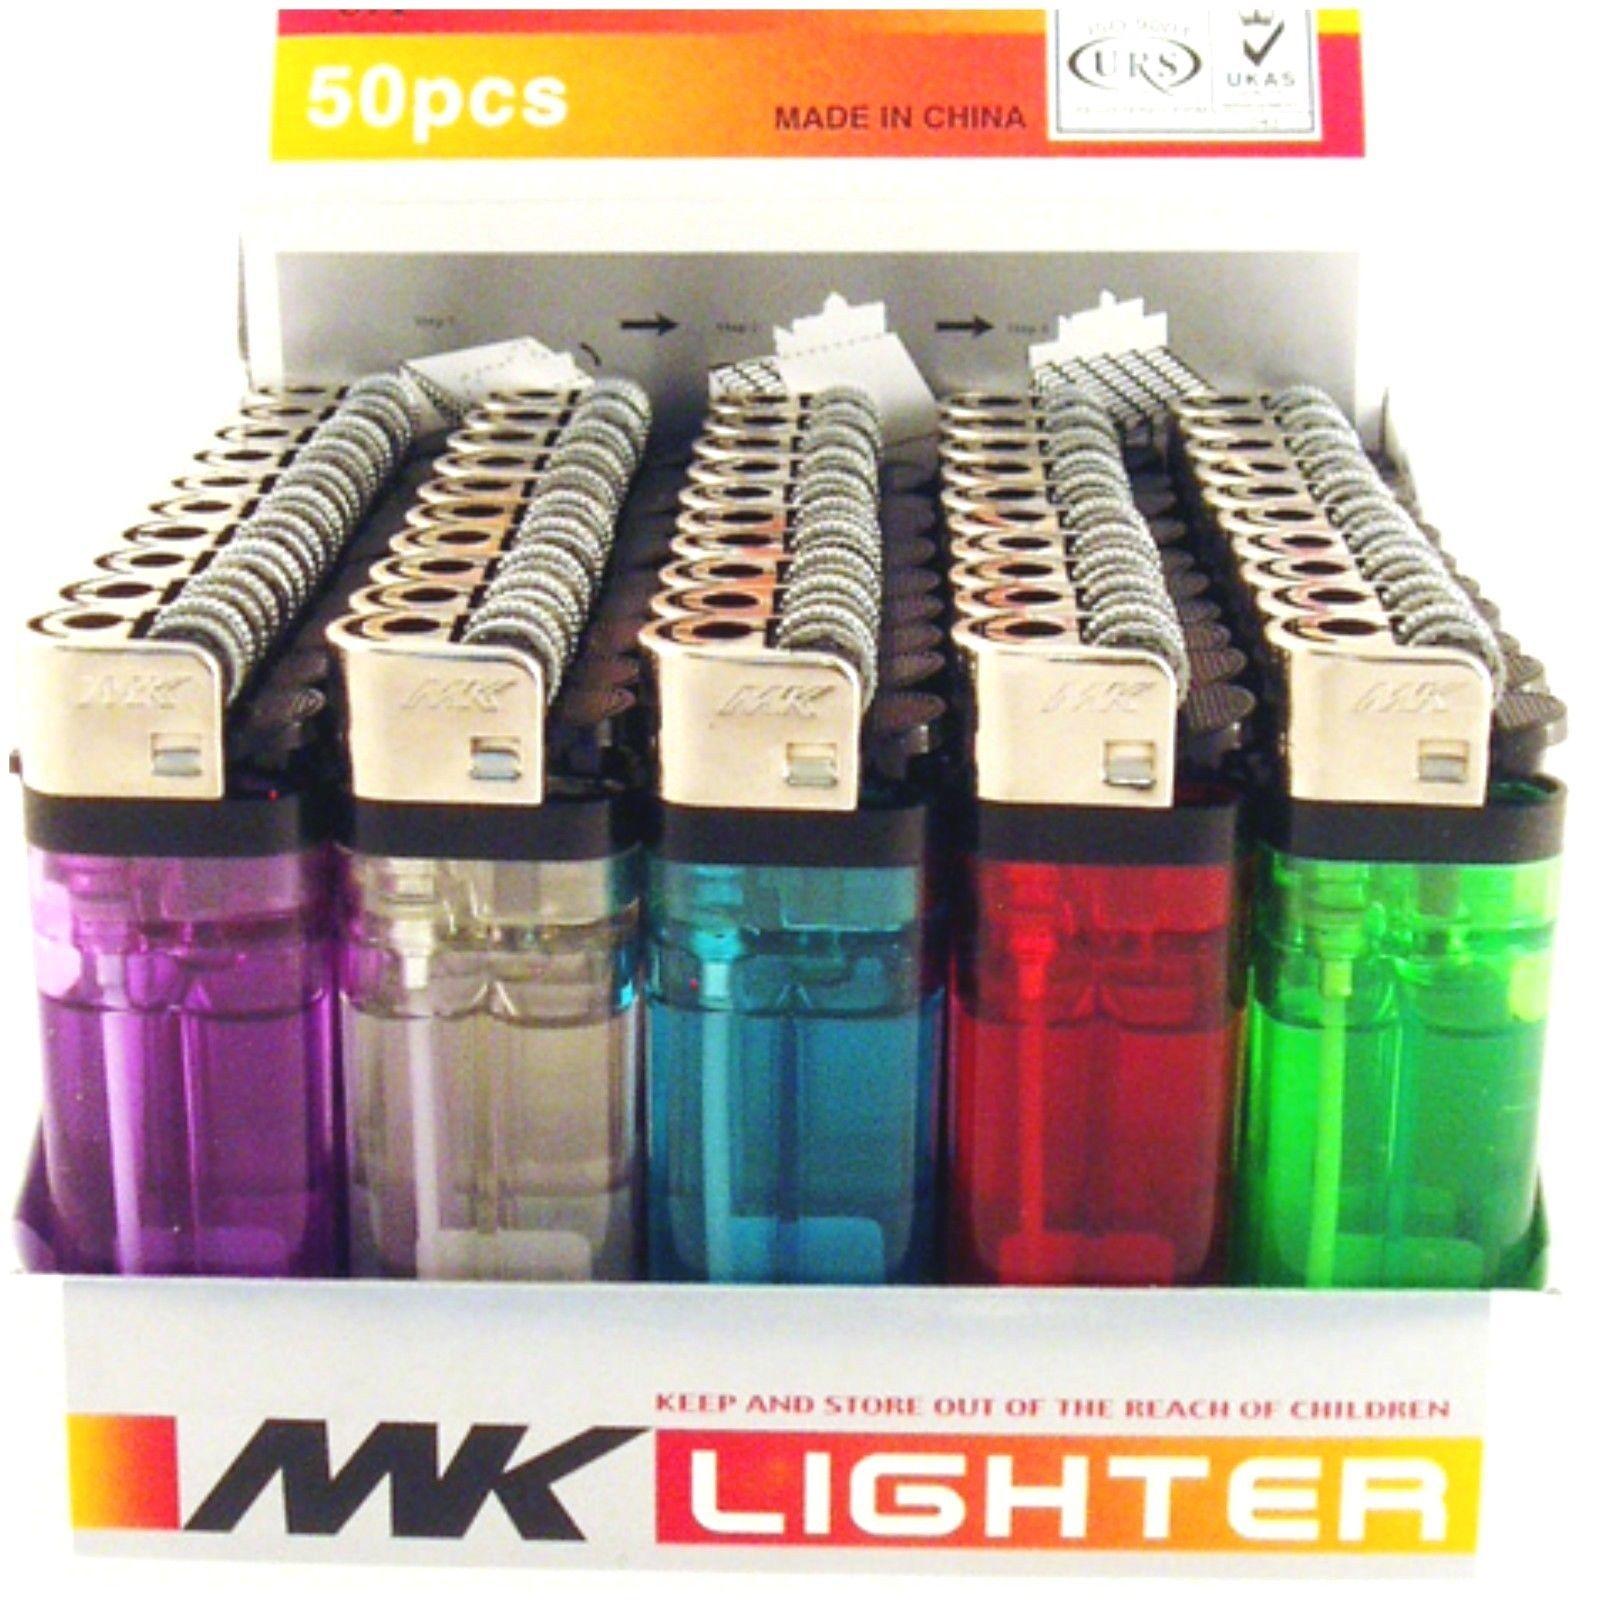 Lot of 50 Disposable Cigarette Lighters Wholesale Bulk Lighter 50 PACK Resale